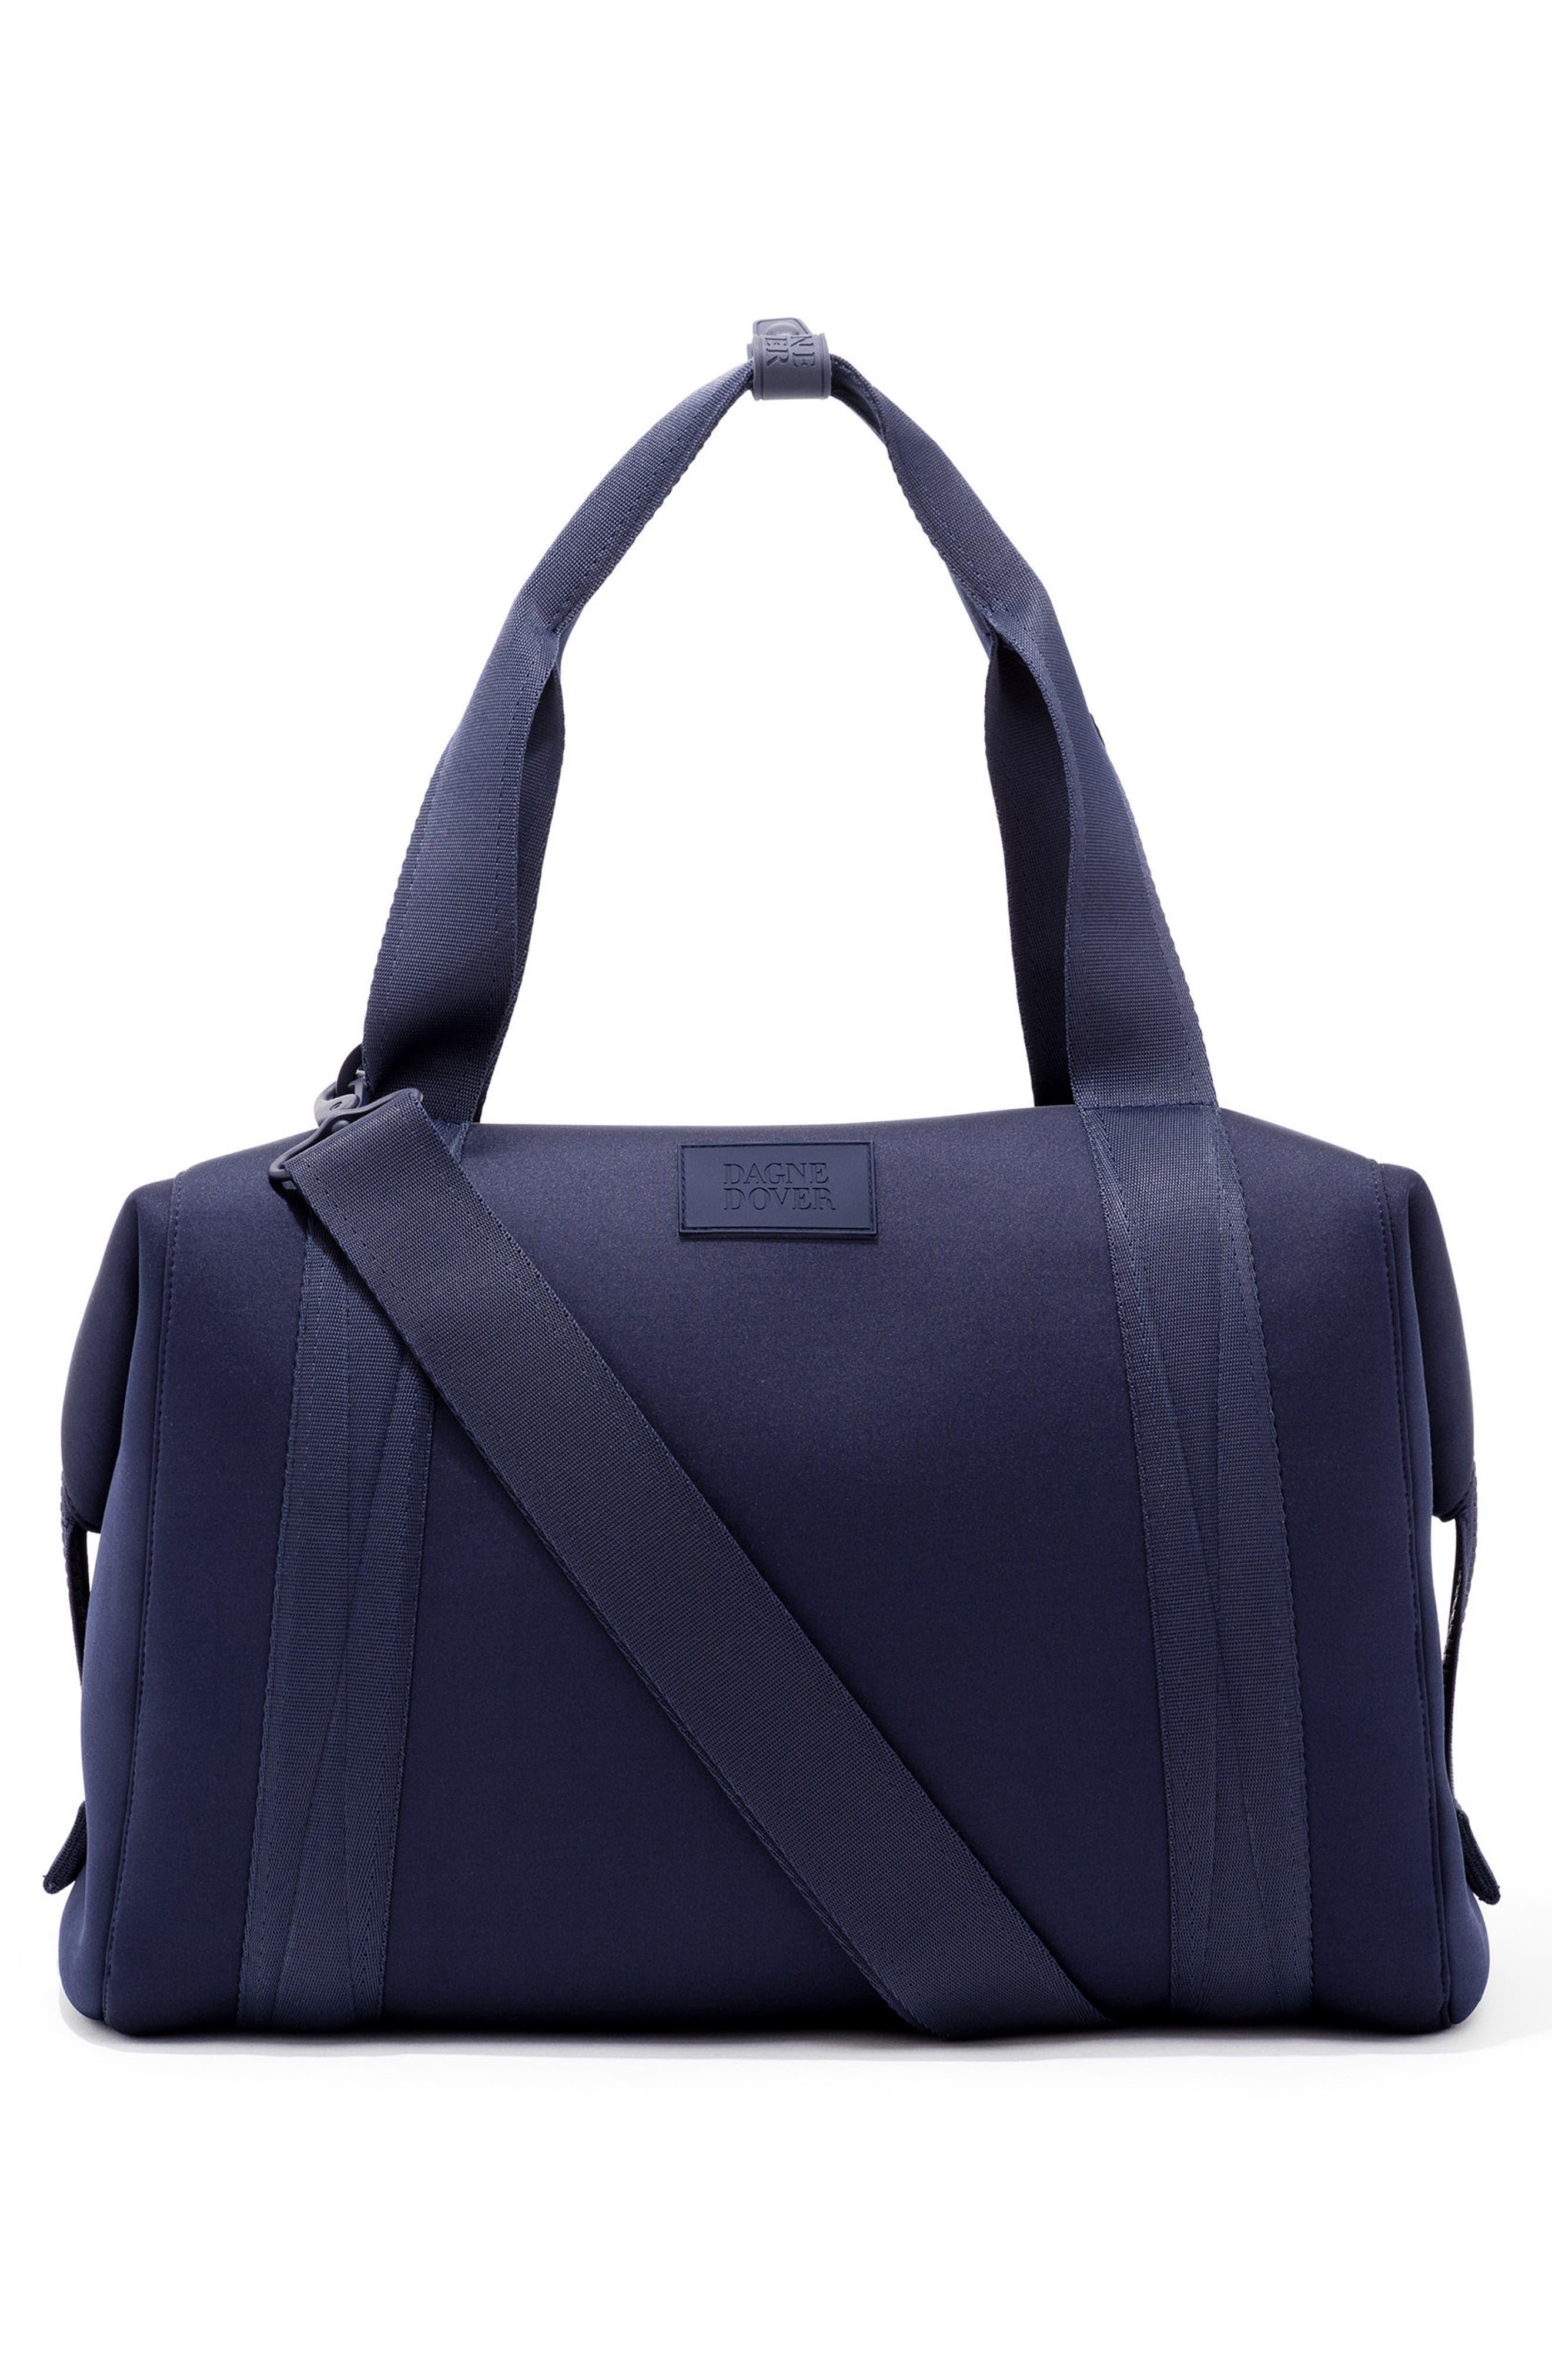 365 Large Landon Neoprene Carryall Duffel Bag,                             Alternate thumbnail 14, color,